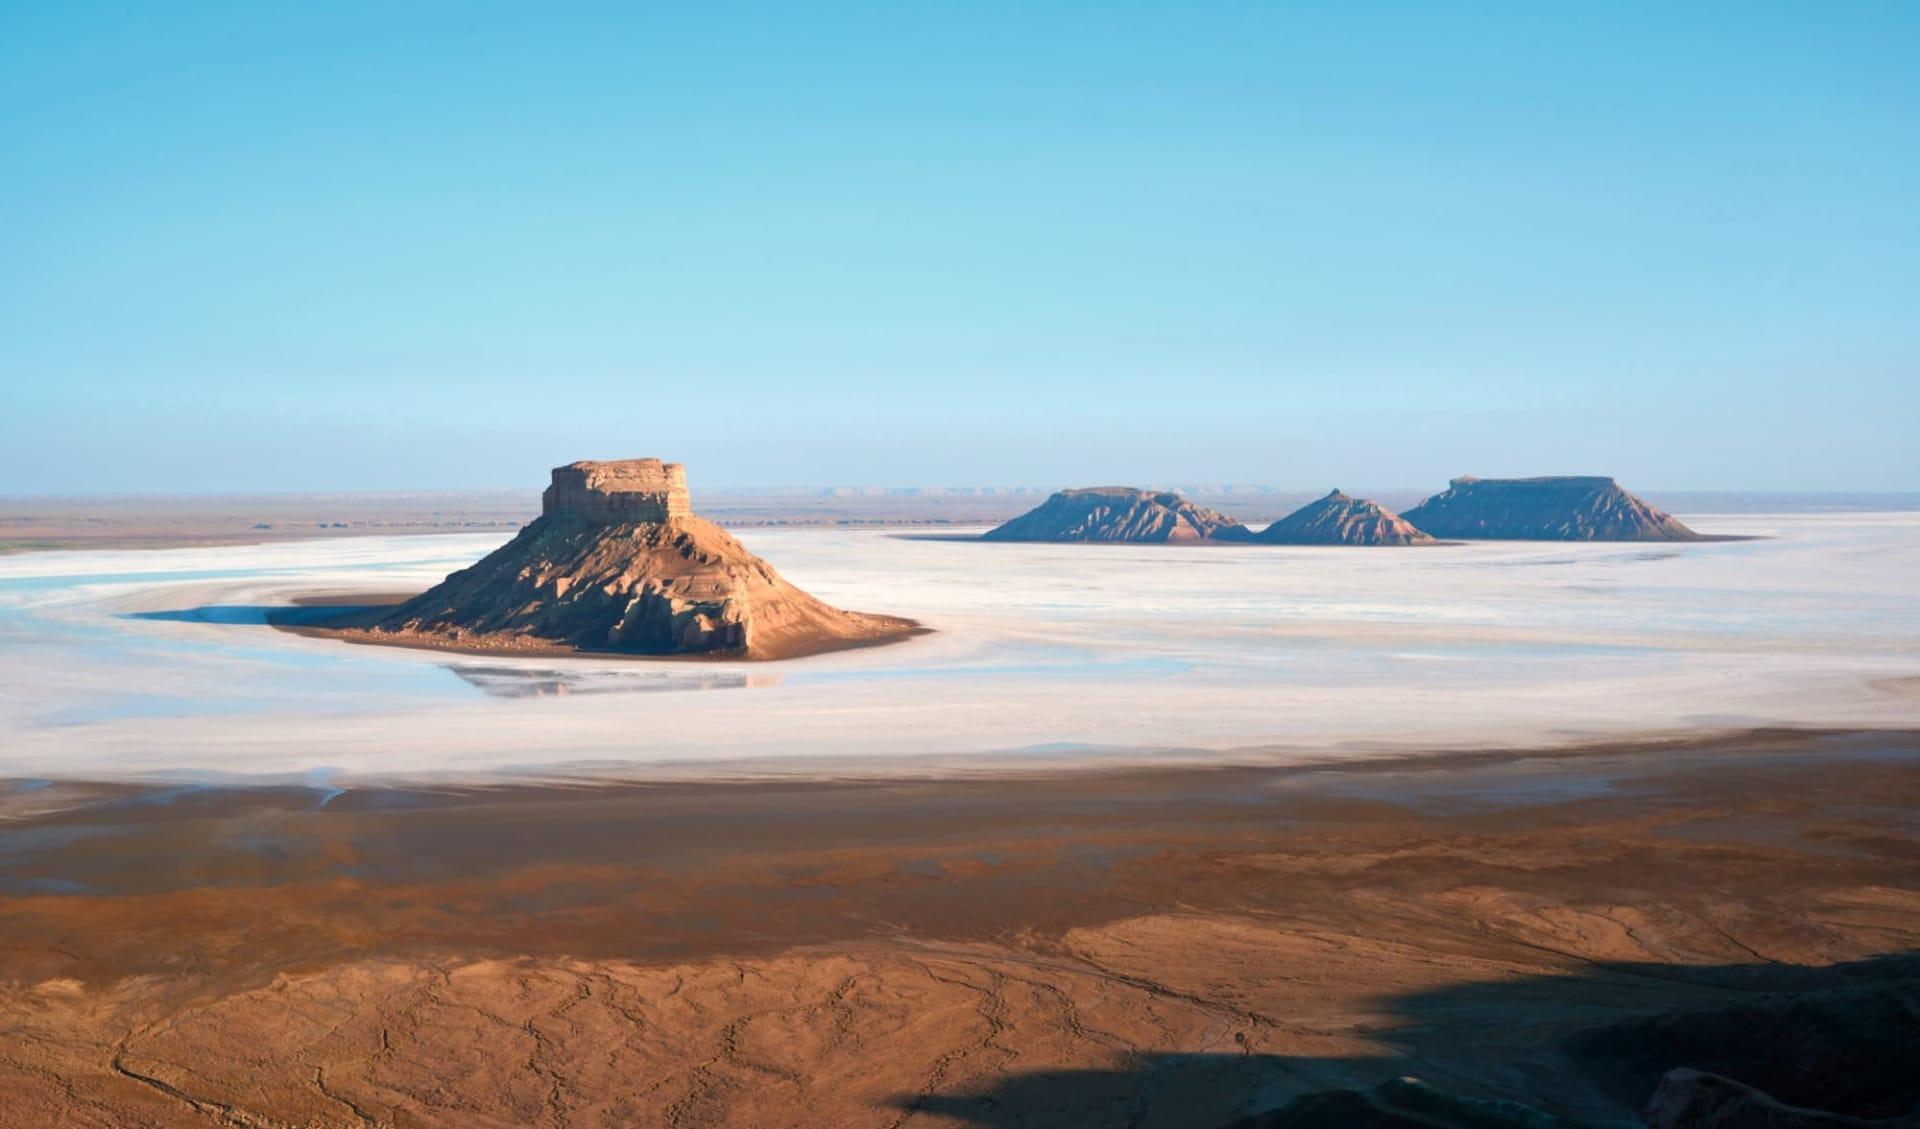 Einmalige Salz-Landschaft im Westen Kasachstans ab Aktau: KA_Ustyurt Plateau_shutterstock_691232413_Yerbolat Shadrakhov